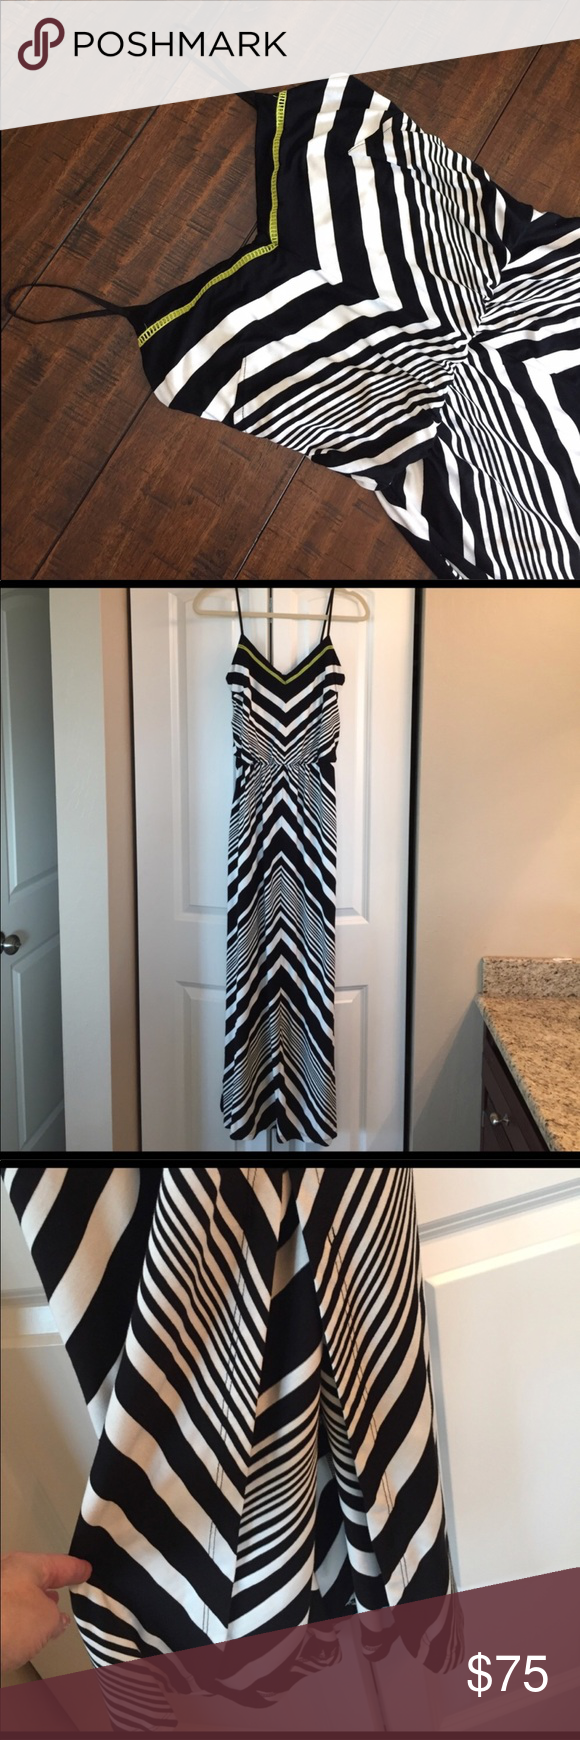 Nwt Vince Camuto Maxi Dress Beautifully Fun Black White Striped Maxi With A Pop Of Yellow Along The Necklin Clothes Design Fashion Design Black White Stripes [ 1740 x 580 Pixel ]